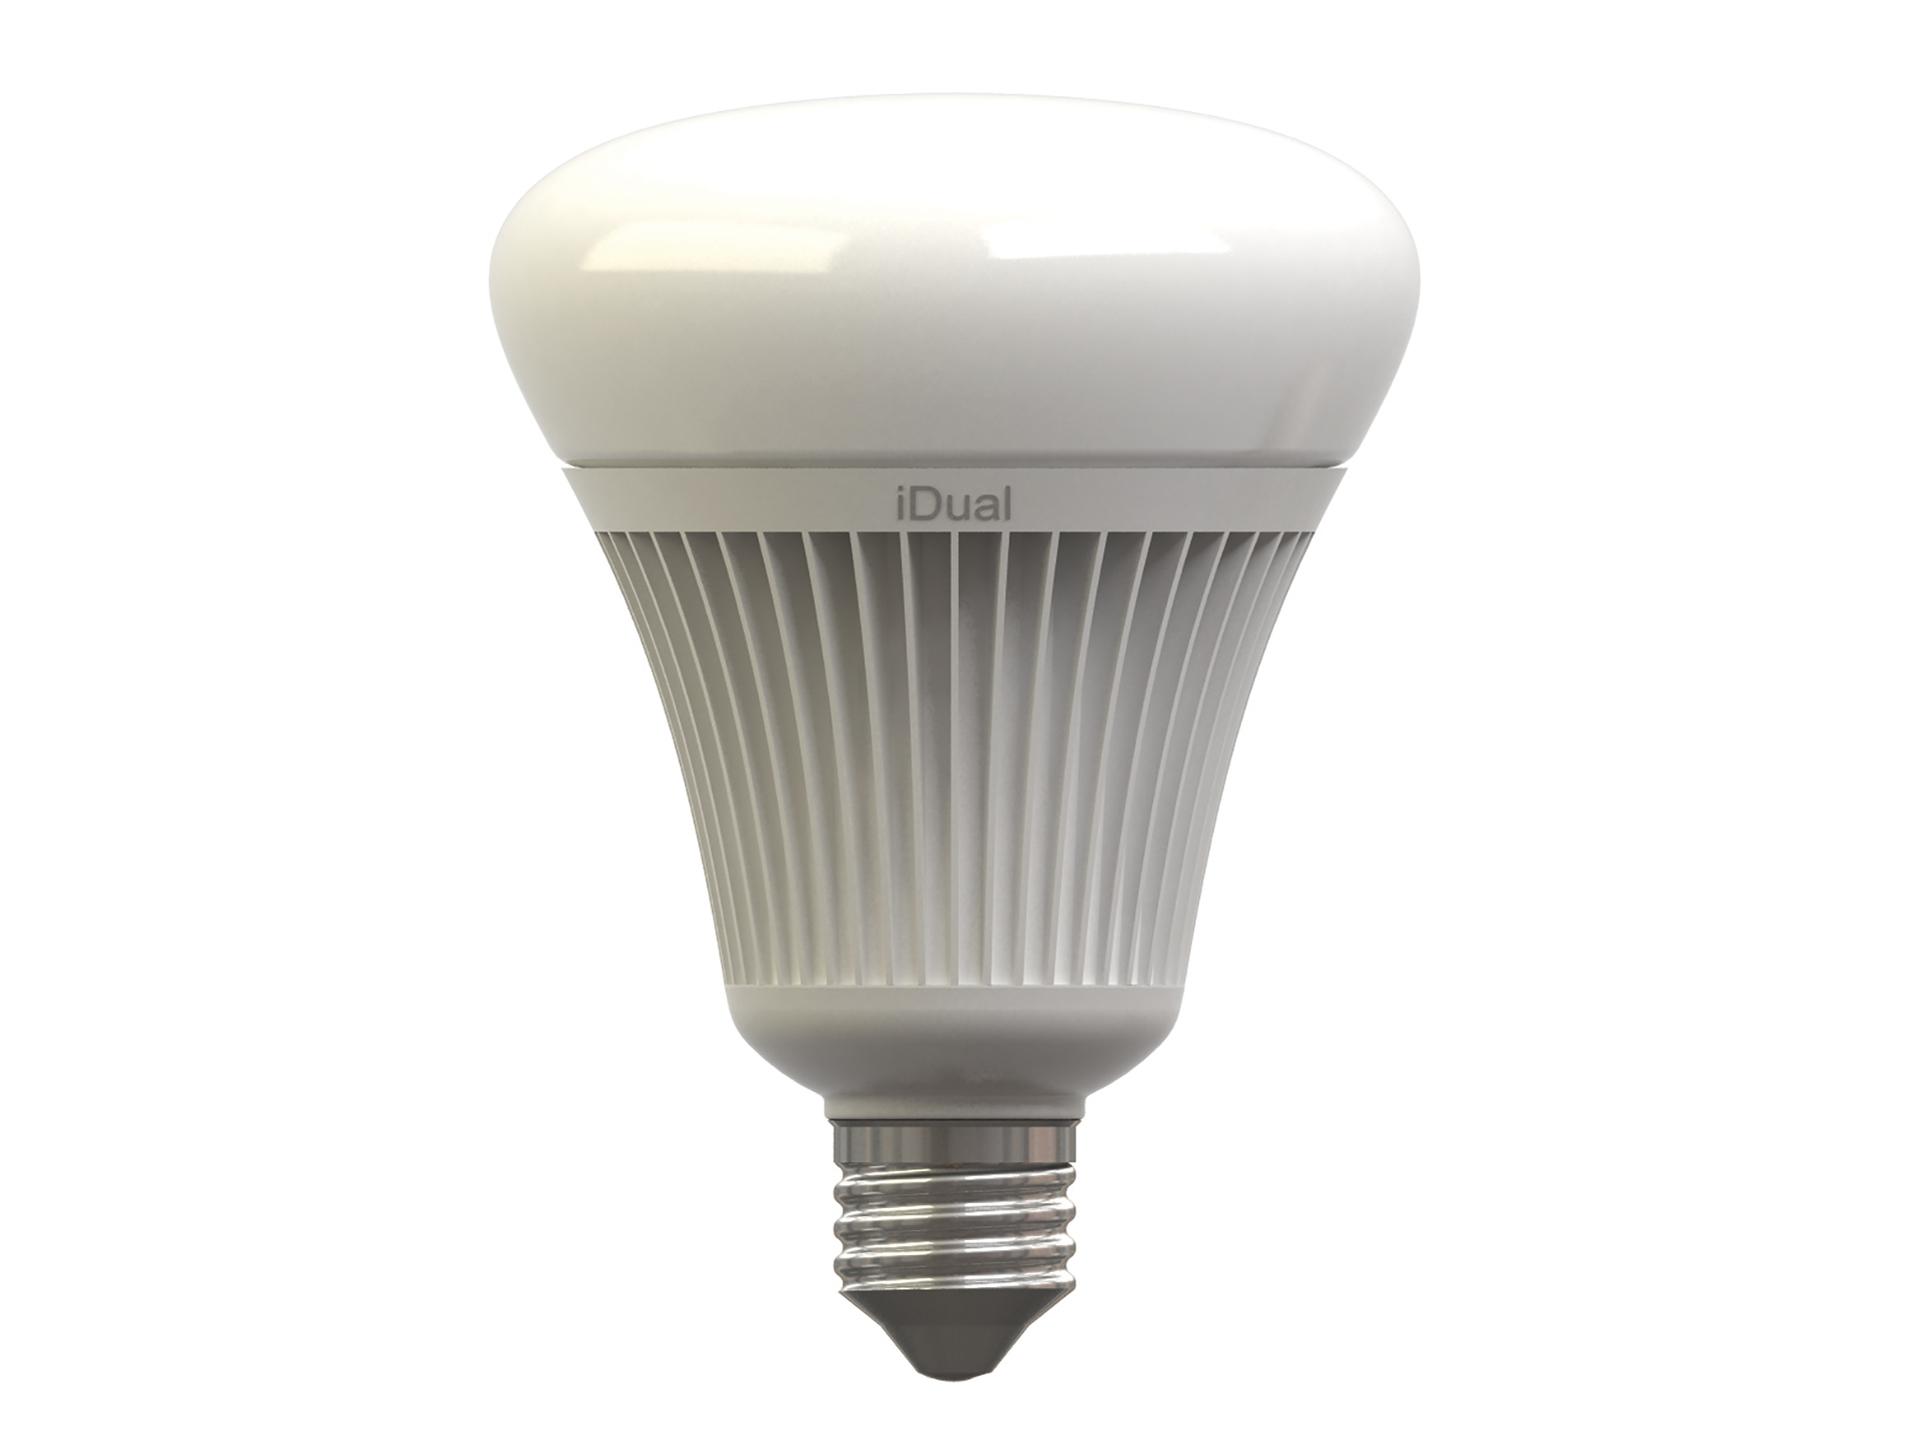 Lampen Op Afstandsbediening : Jedi led lamp jedi idual g100 e27 16w met afstandsbediening hubo